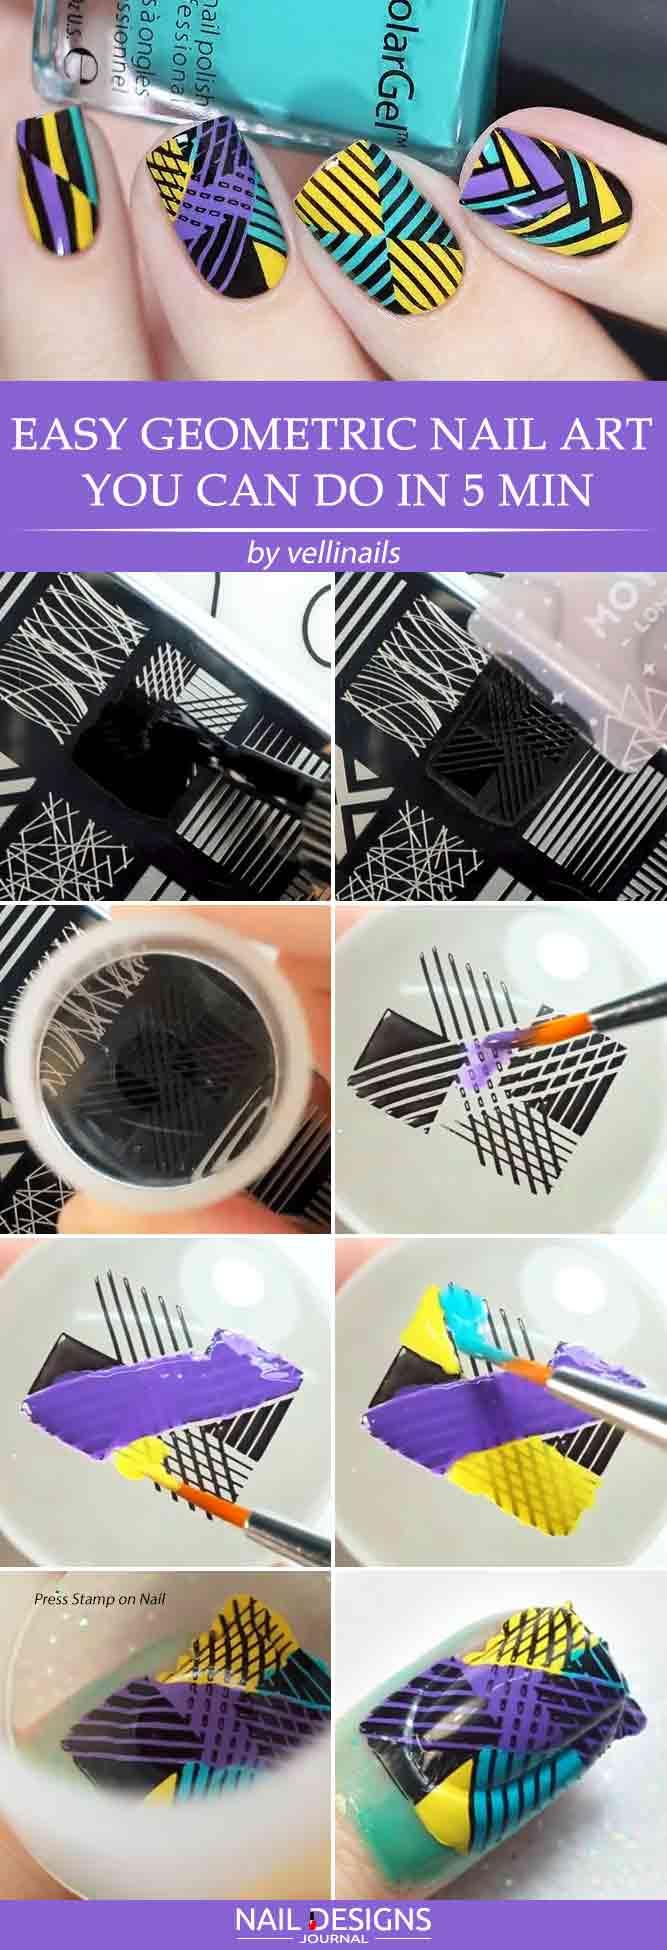 Easy Geometric Nail Art You Can Do In 5 Min